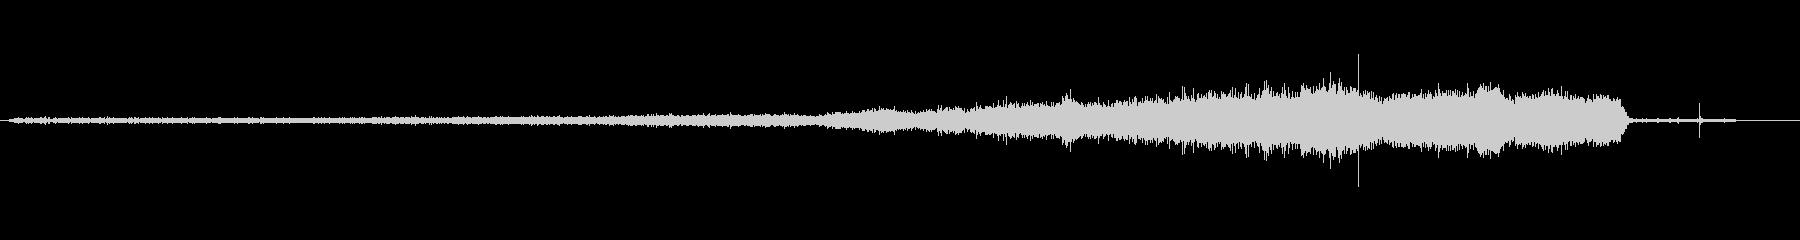 EXT:アプローチ、スロー、プルア...の未再生の波形